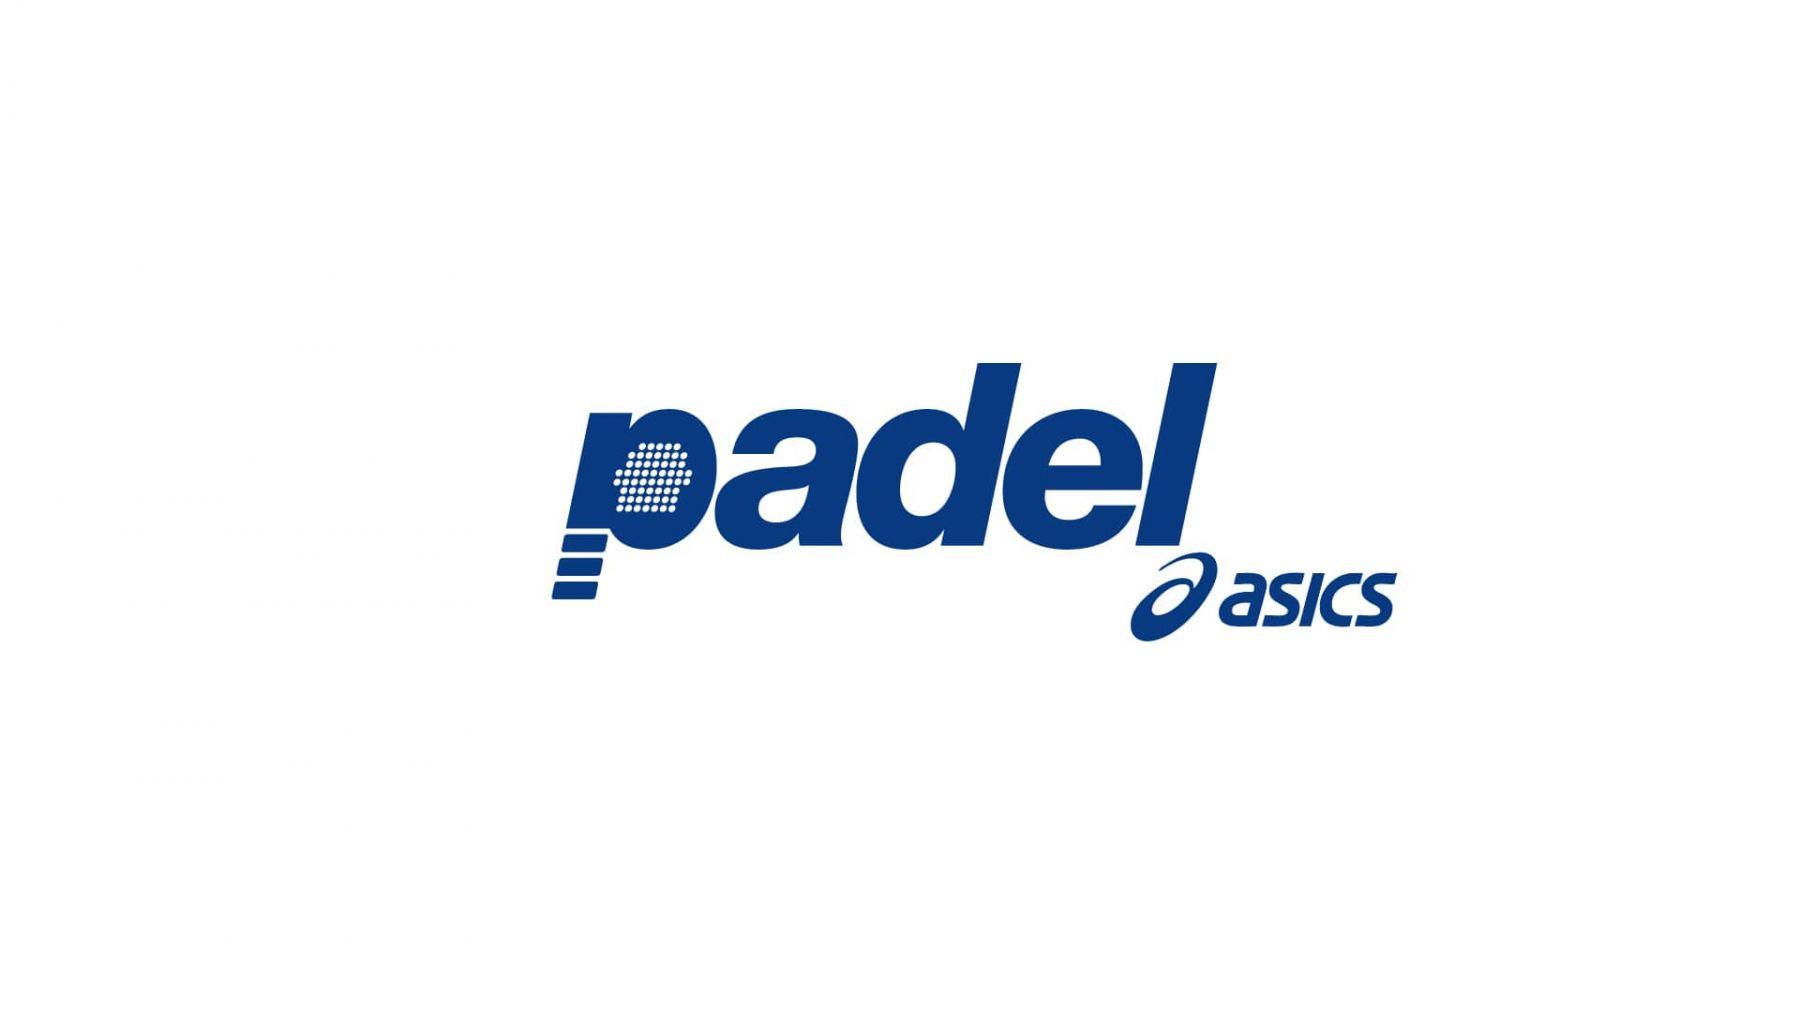 Asics Padel logo design